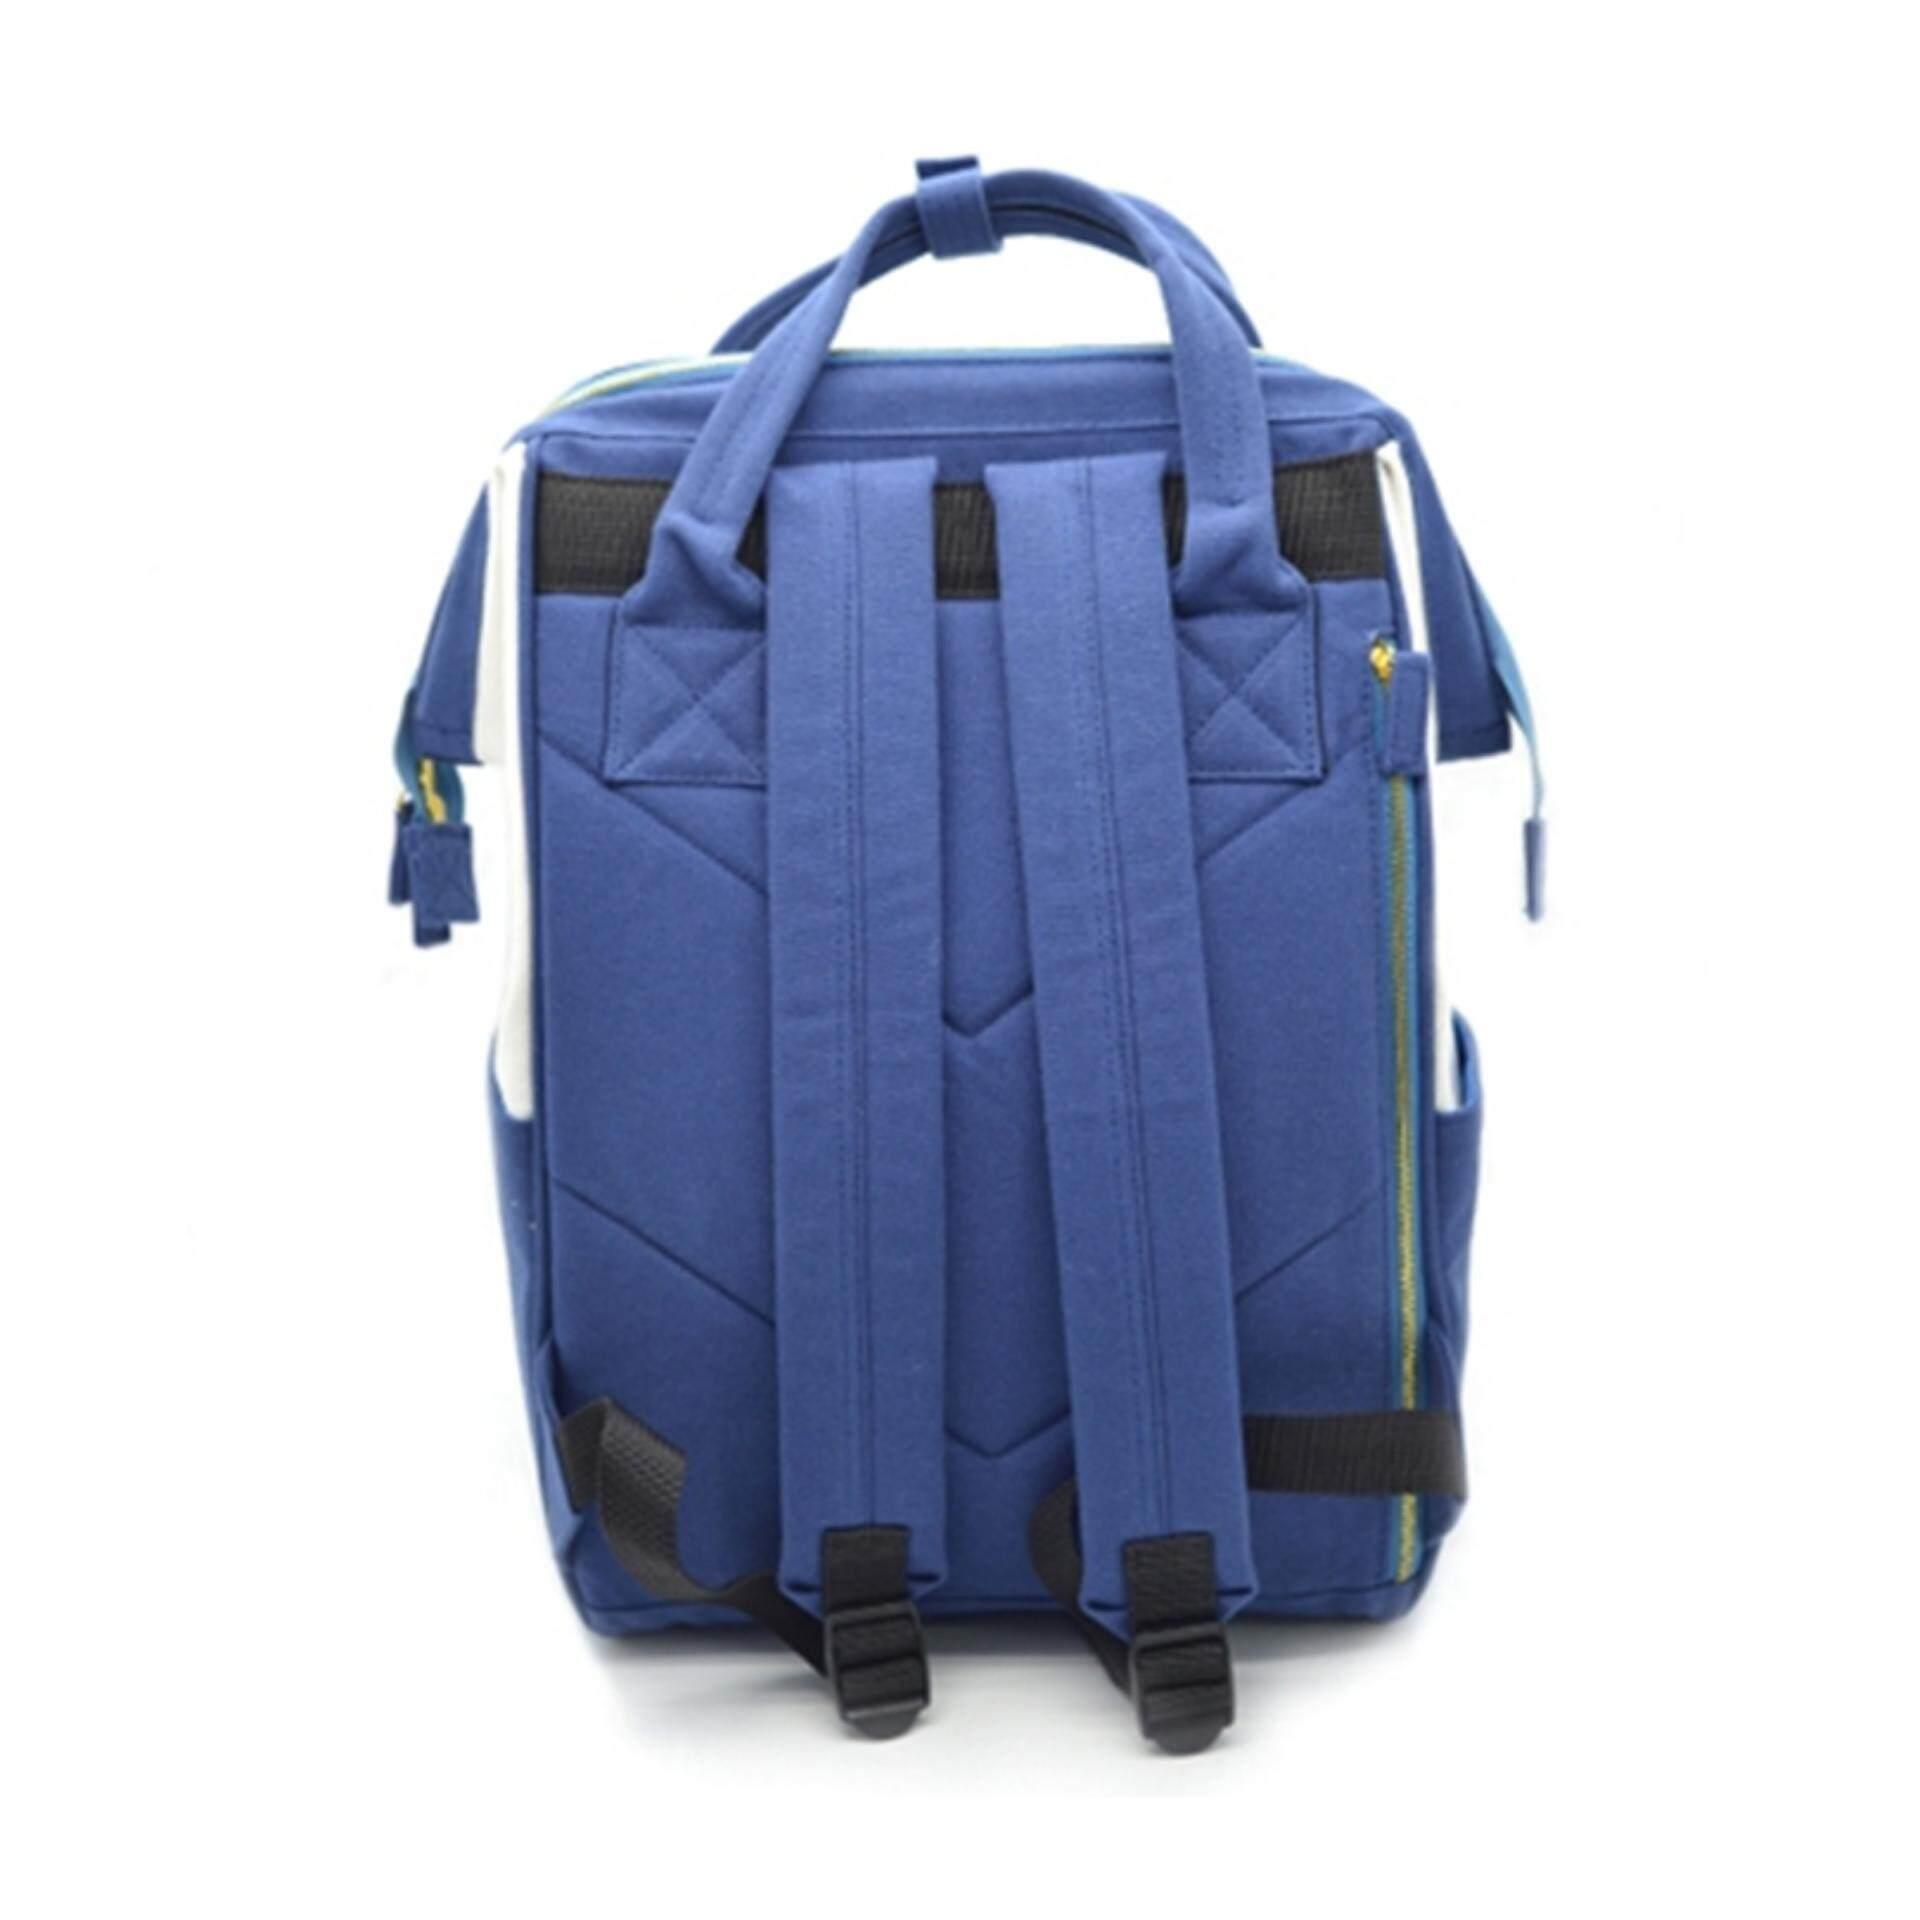 "Disney Tsum Tsum Canvas Backpack 15.5"" Inches - Blue Colour"